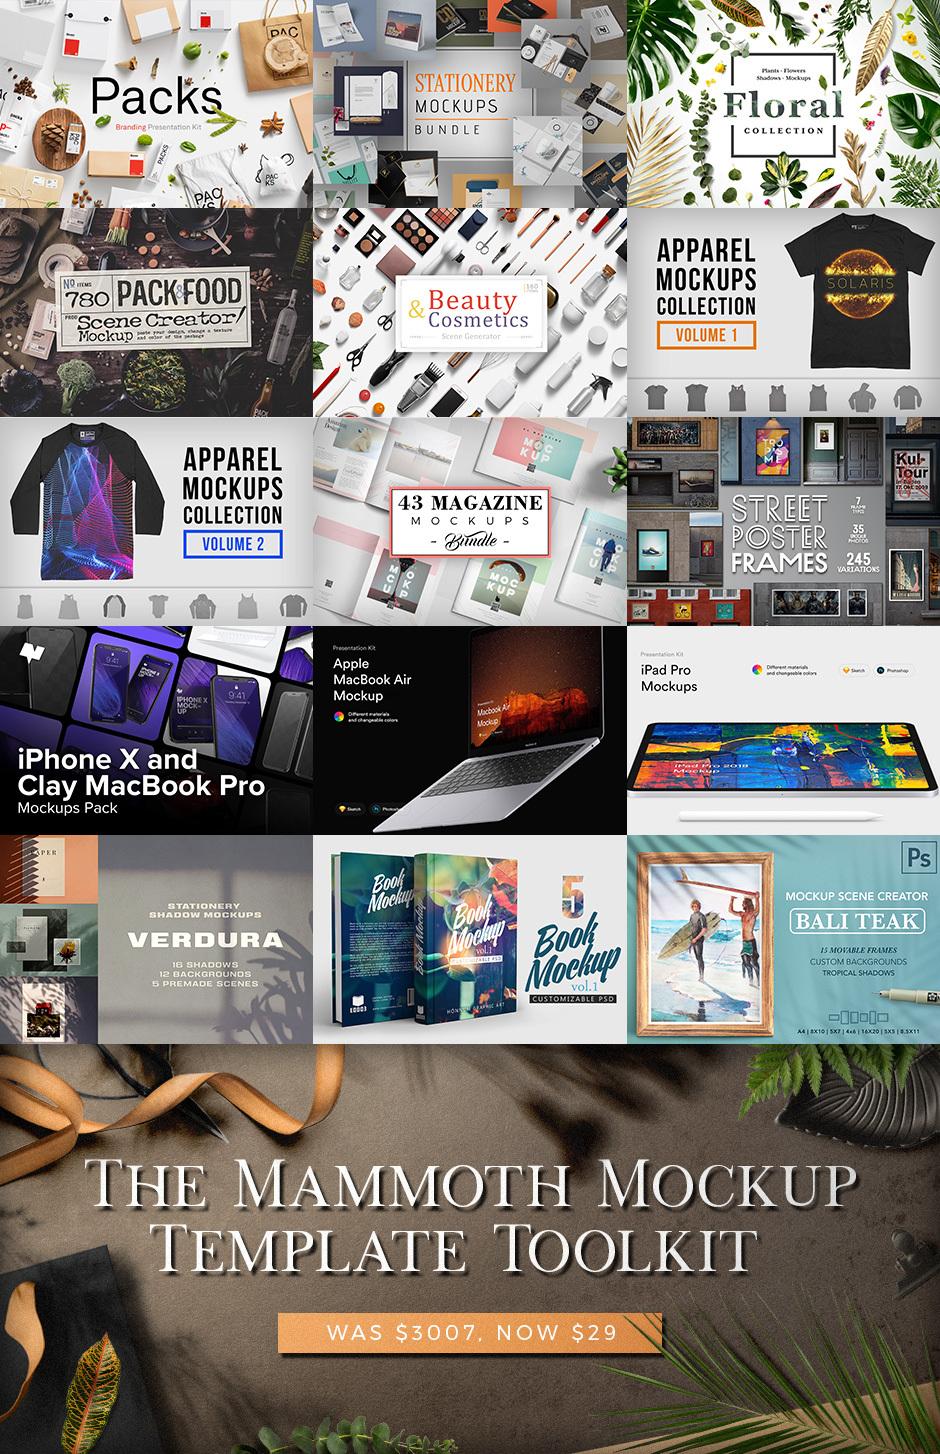 product-grid_mammoth_mockup.jpg